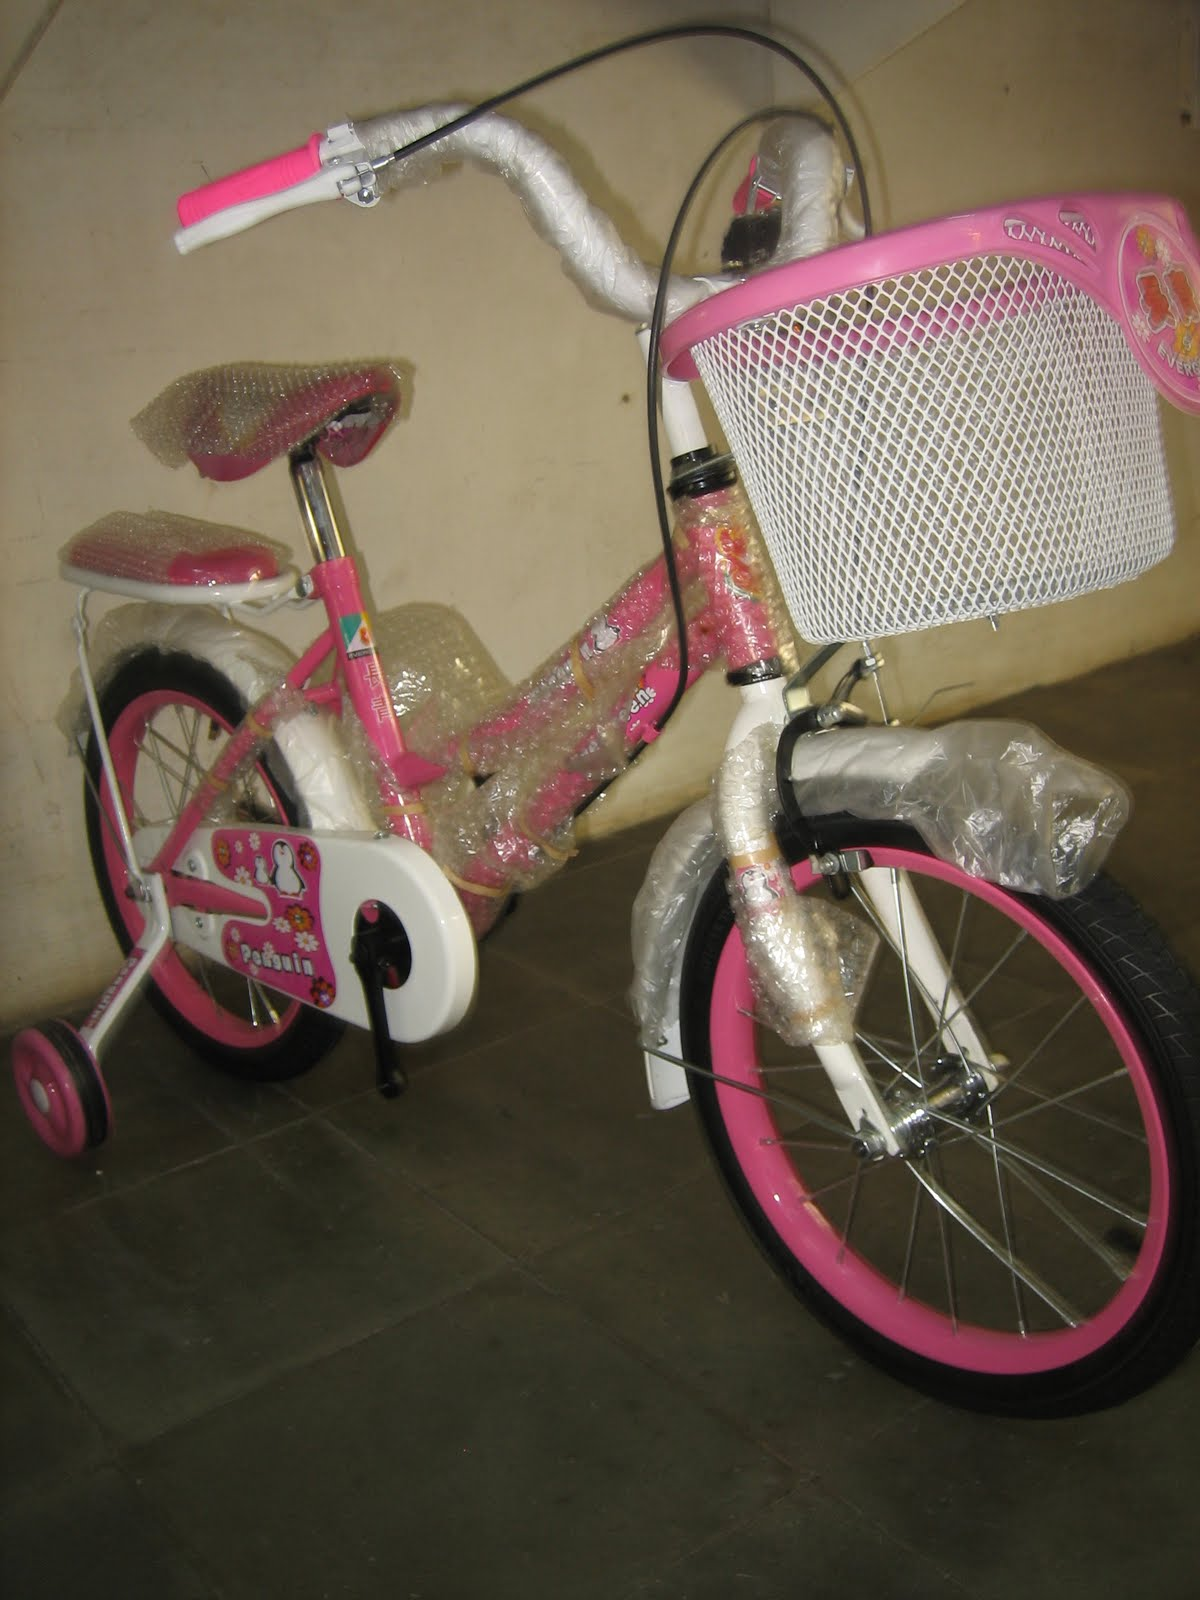 tokomagenta: A Showcase of Products: Sepeda Anak EVERGREEN